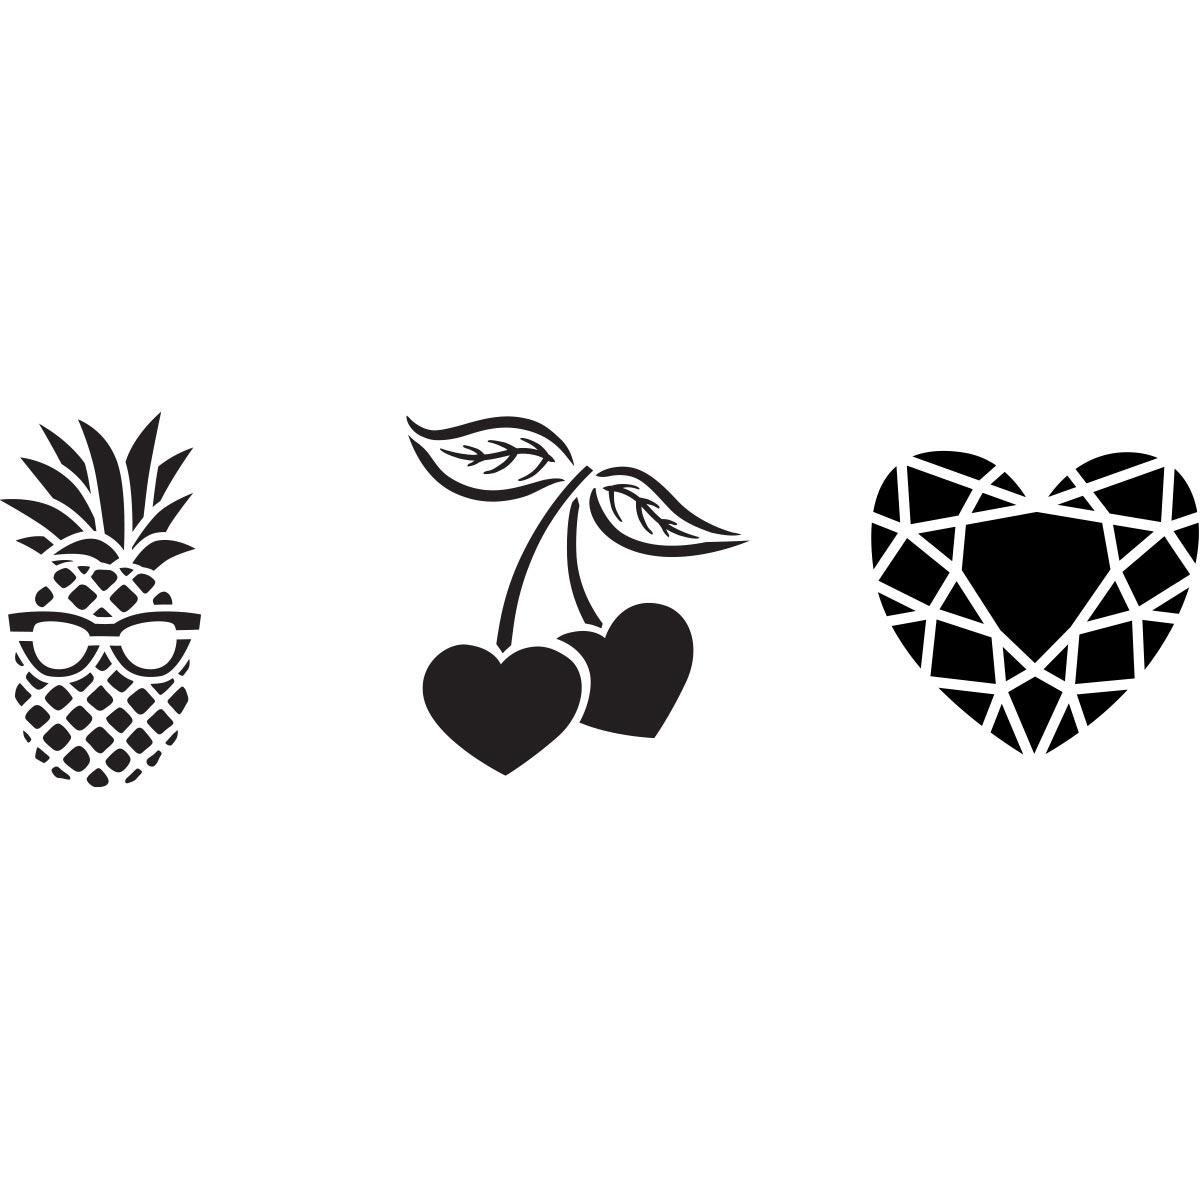 Fabric Creations™ Adhesive Stencils - Mini - Pineapple-Cherry-Diamond, 3